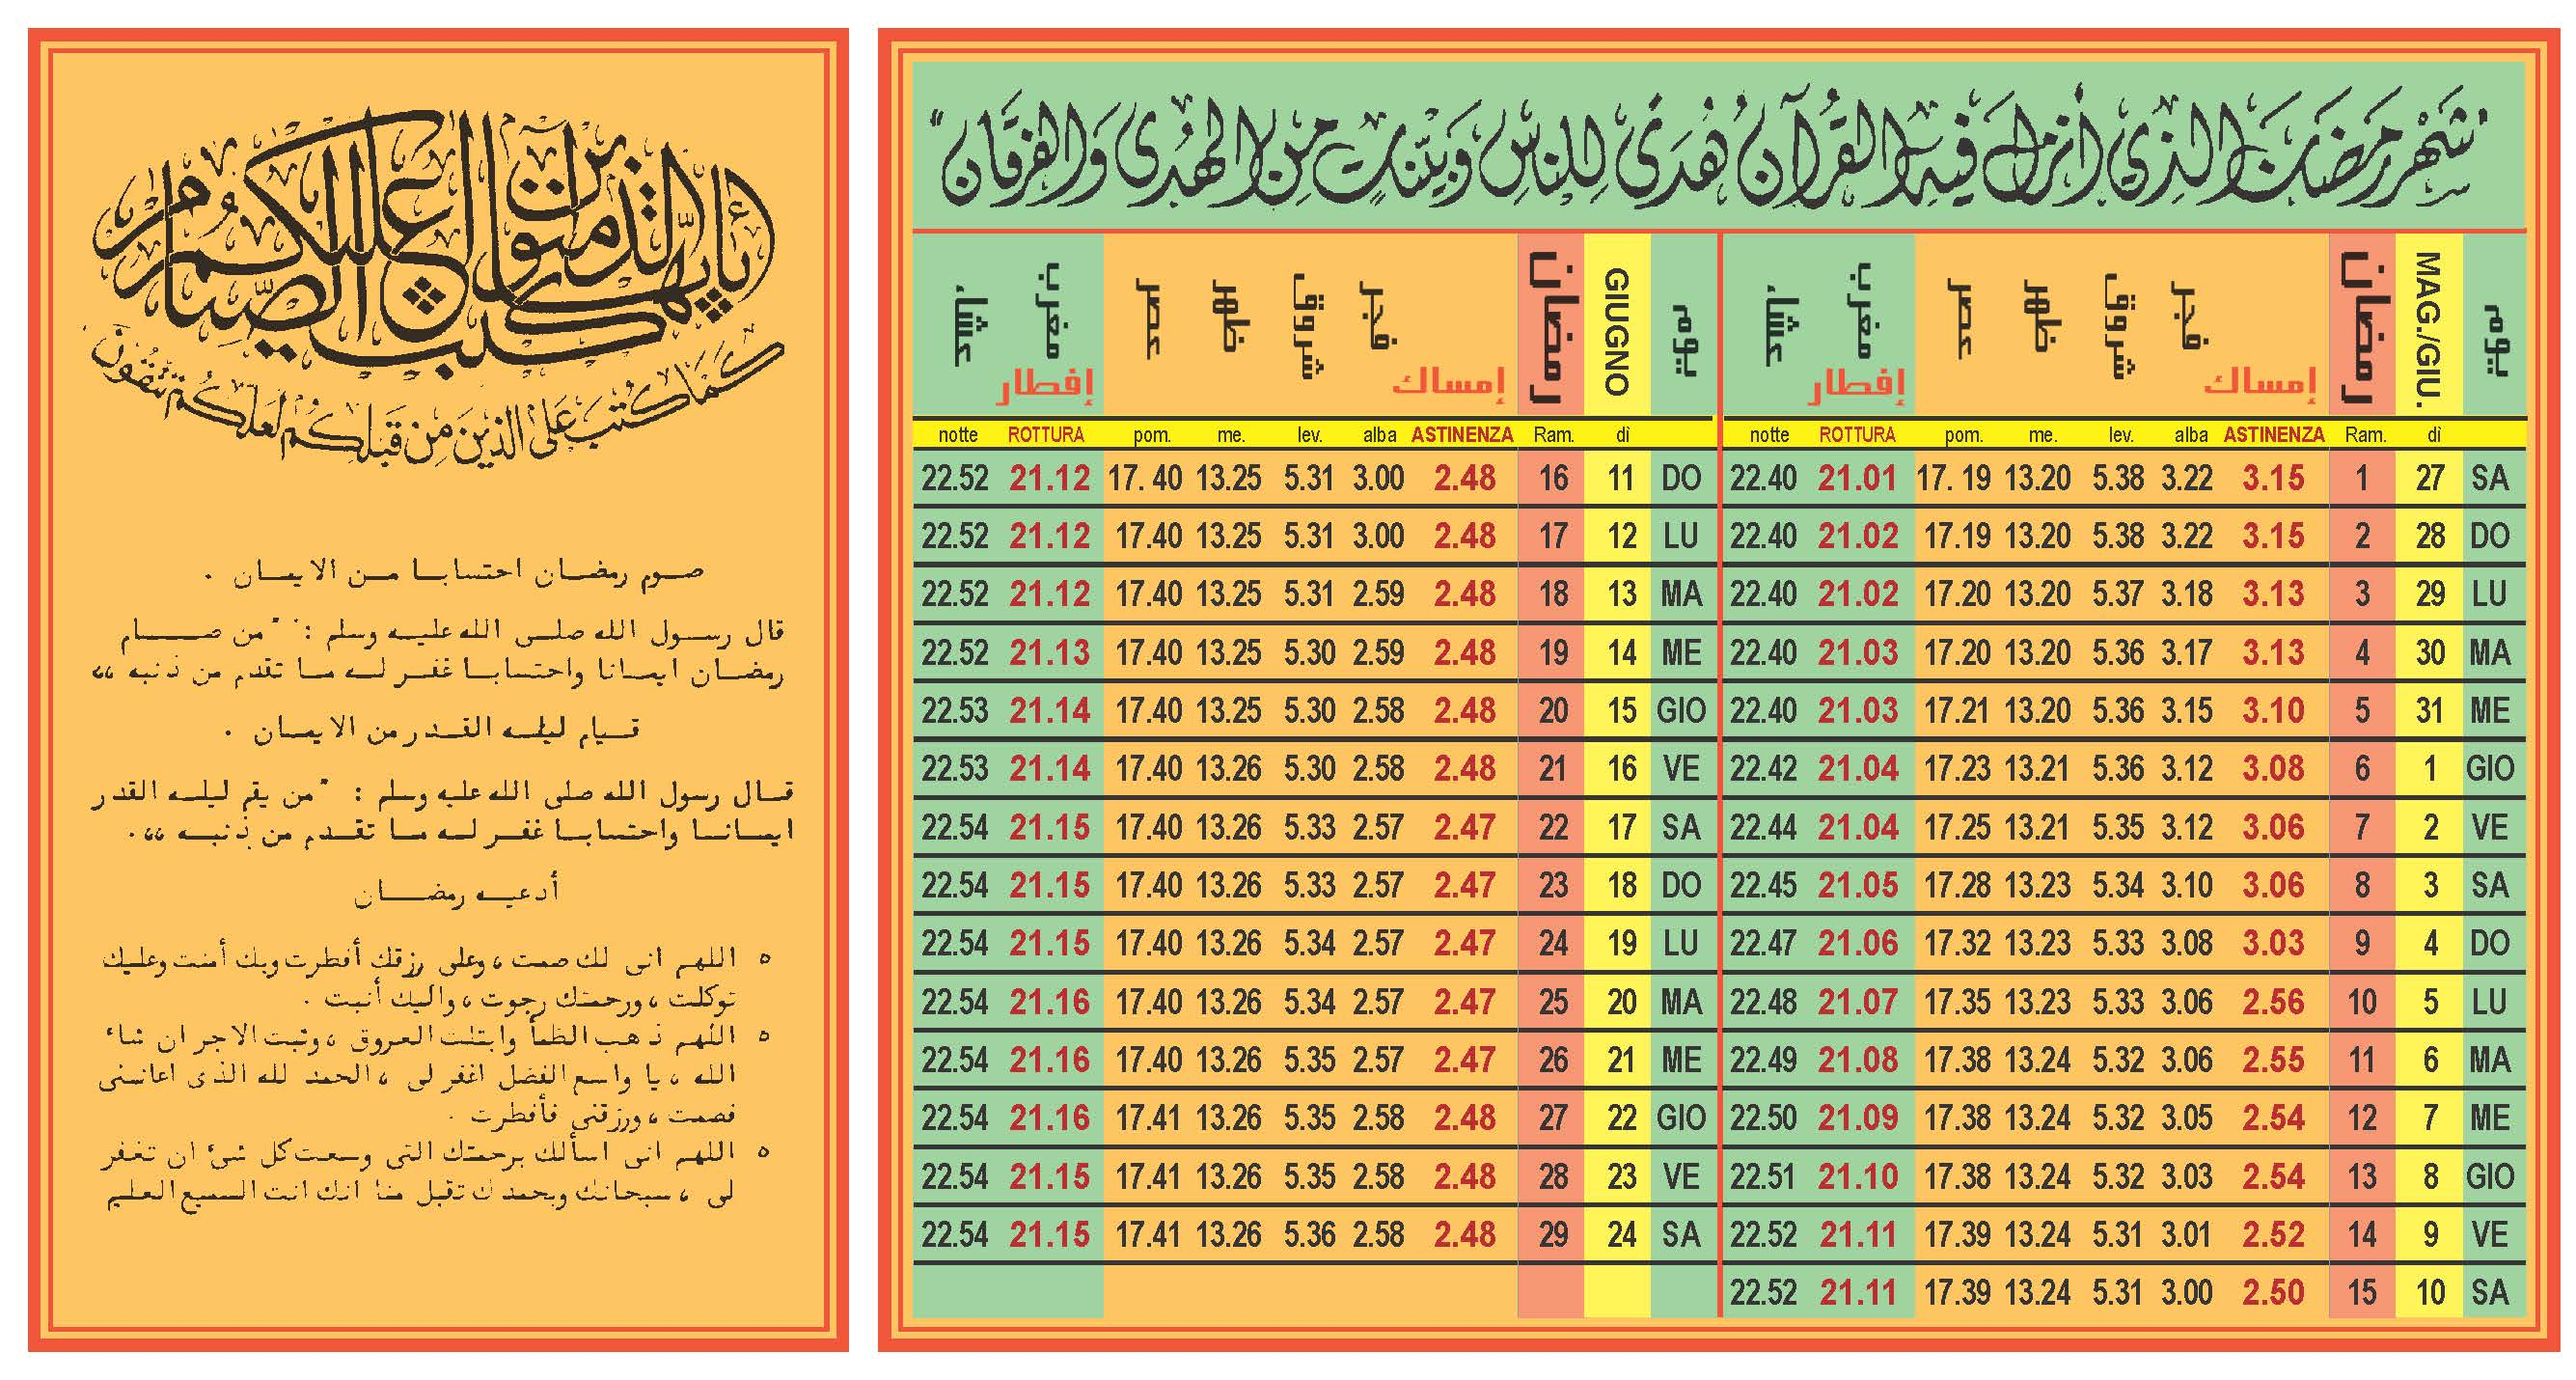 Il Calendario Islamico.O Calendario Islamico Calendarios Hd